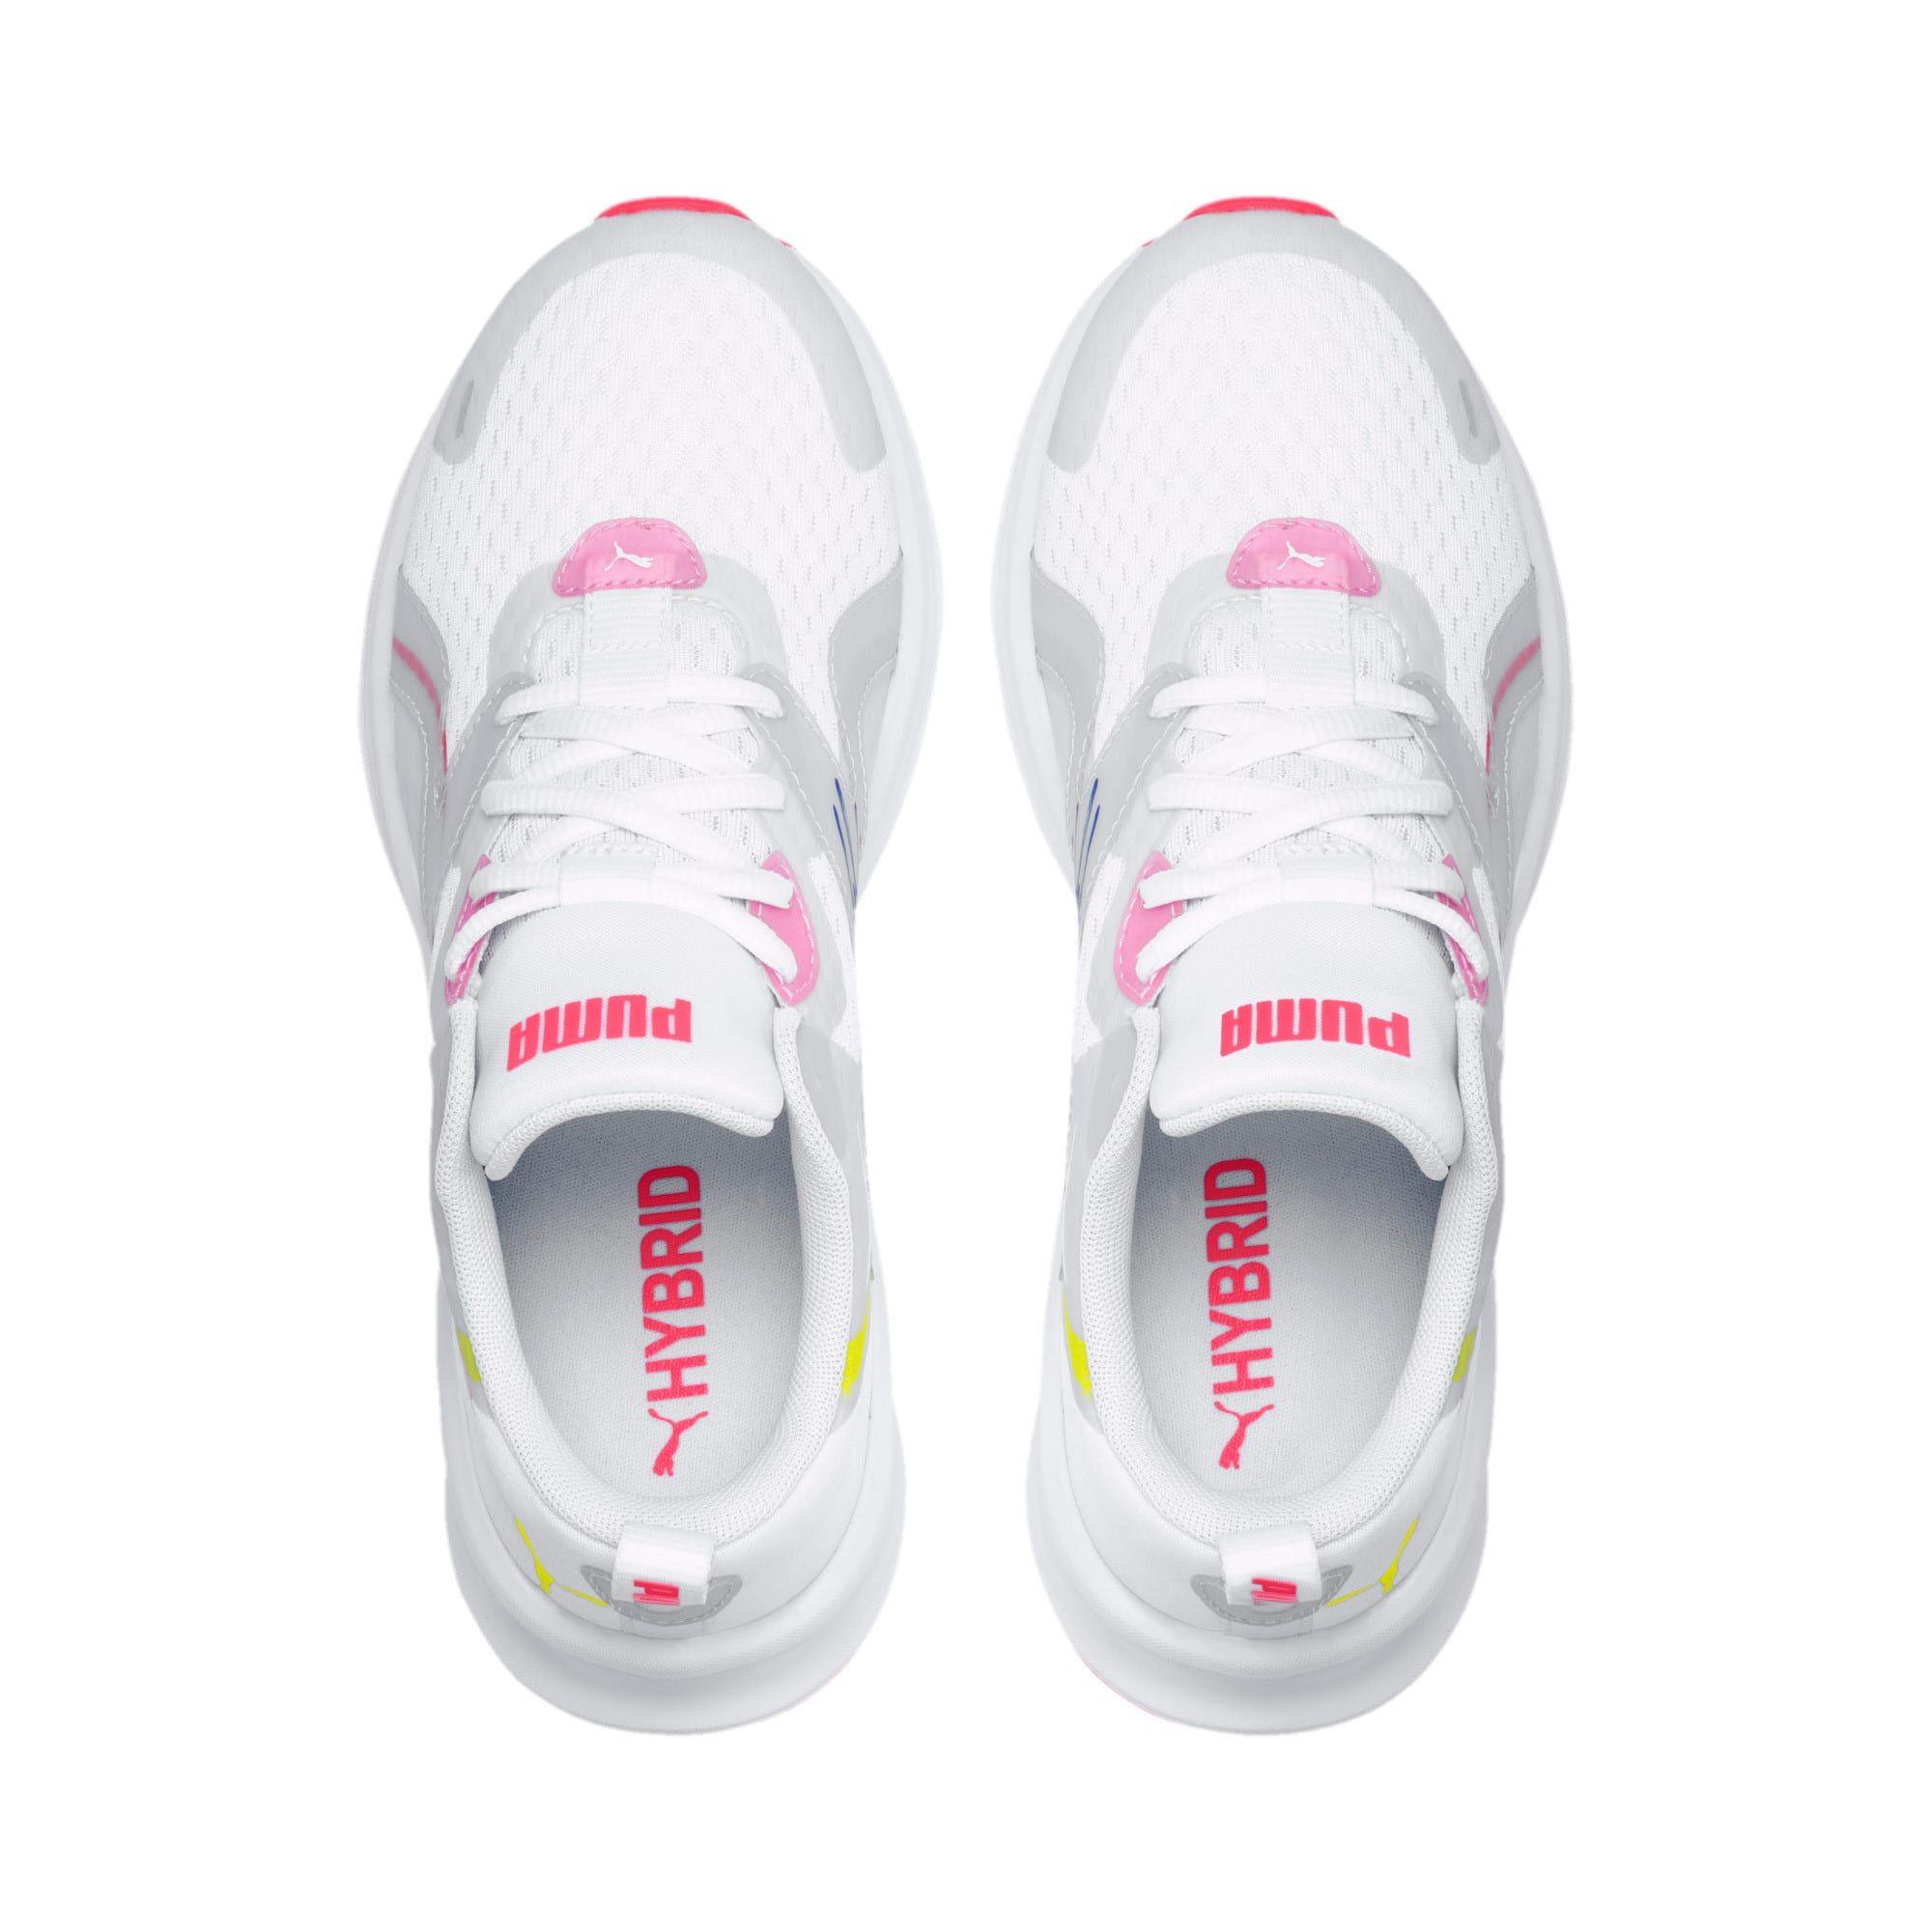 chaussures puma femme jaune